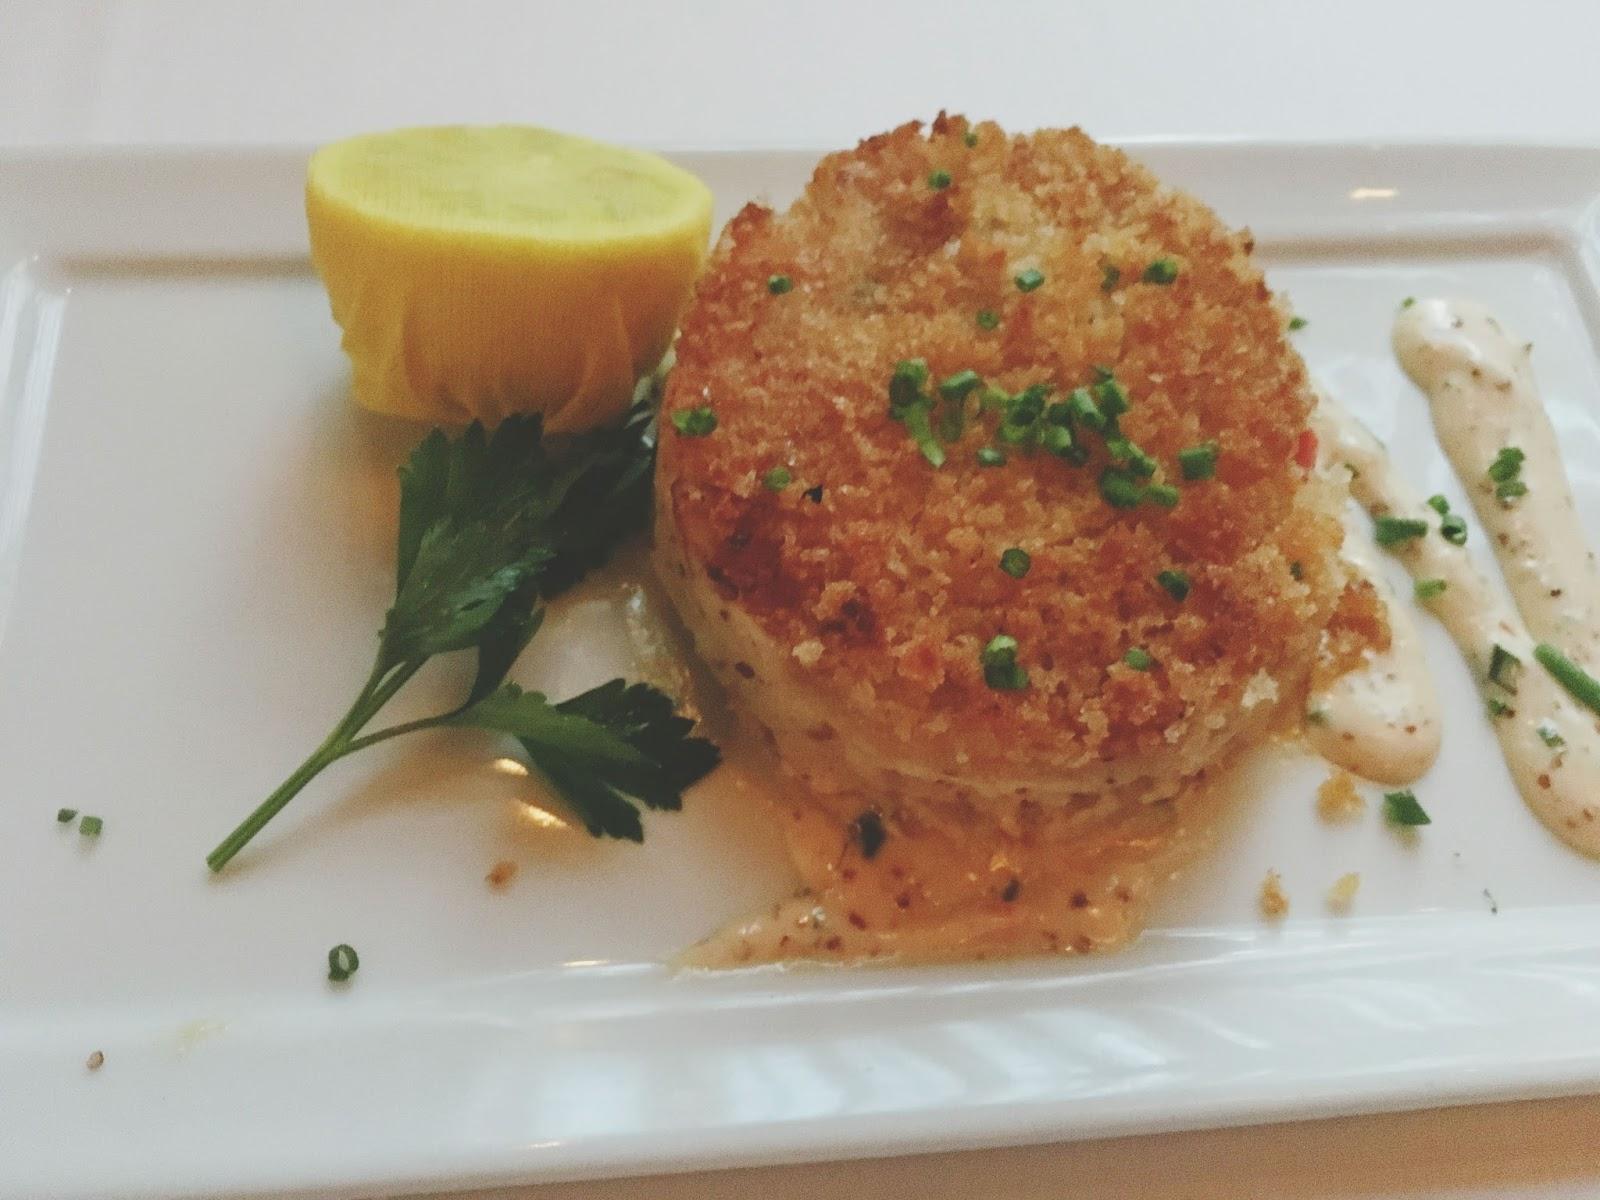 crab cake at Eddie V's - A restaurant in Houston, Texas